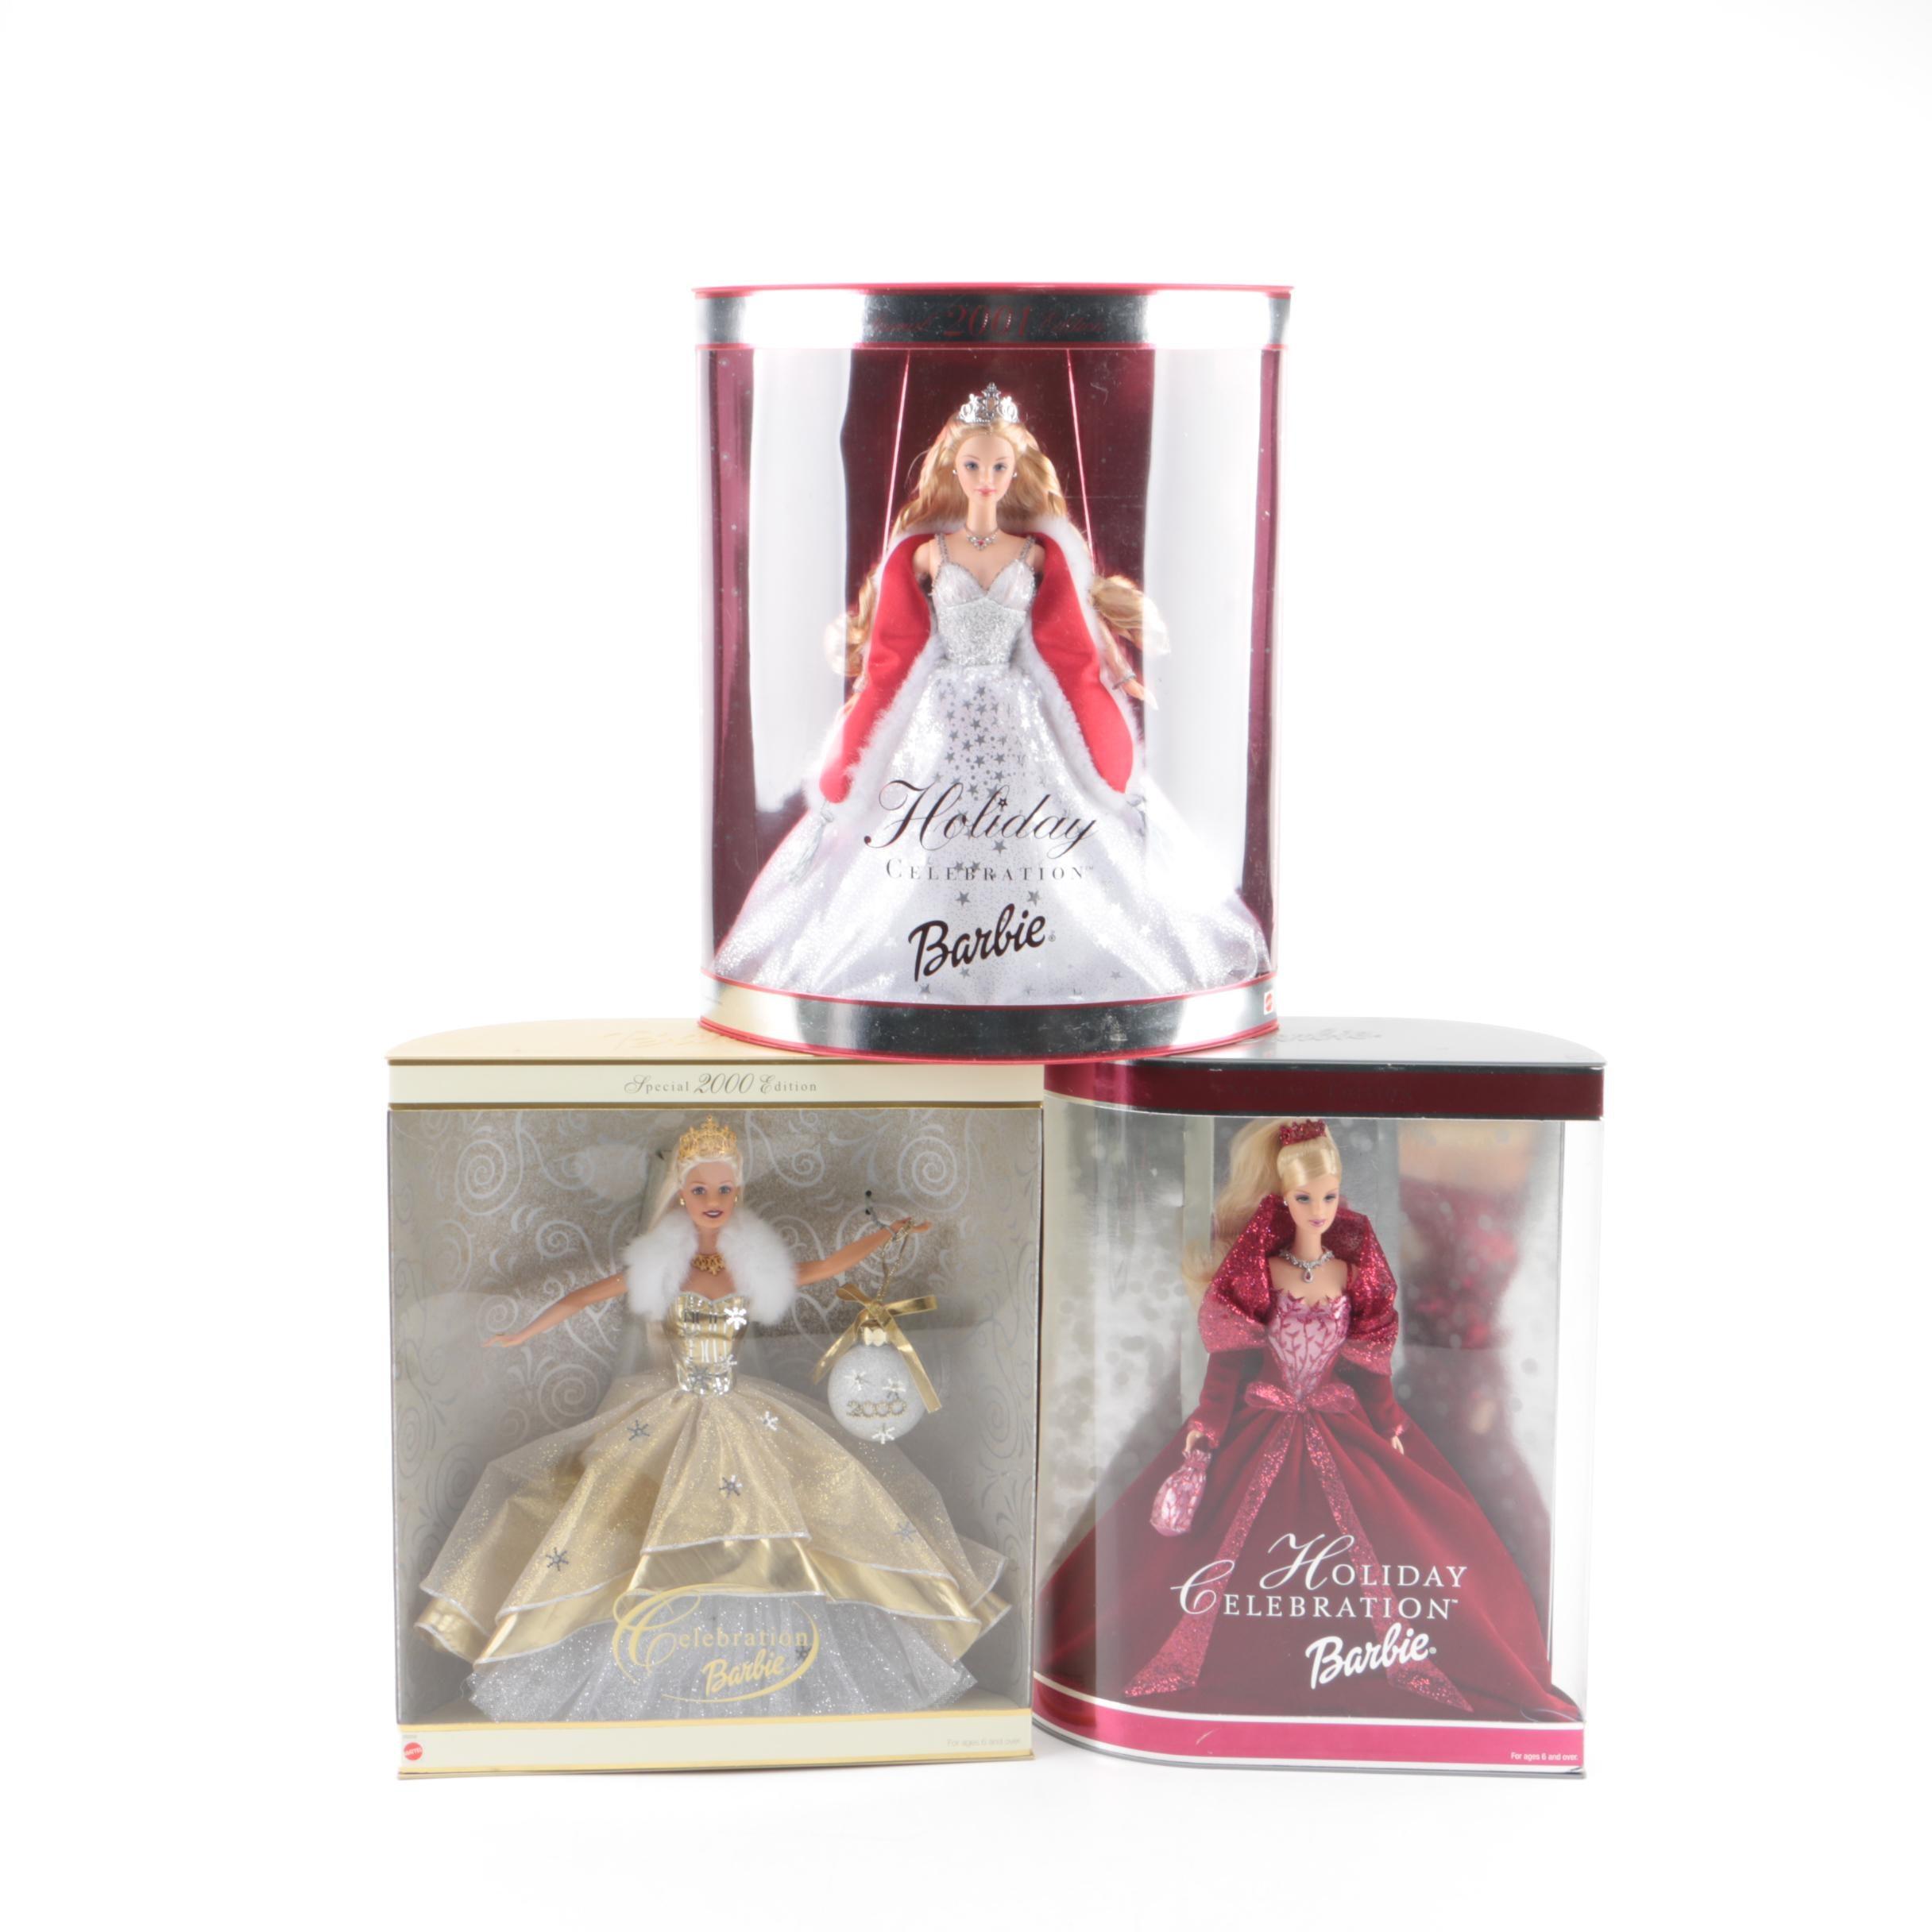 "2000s Mattel ""Holiday Celebration Barbie"" Dolls"